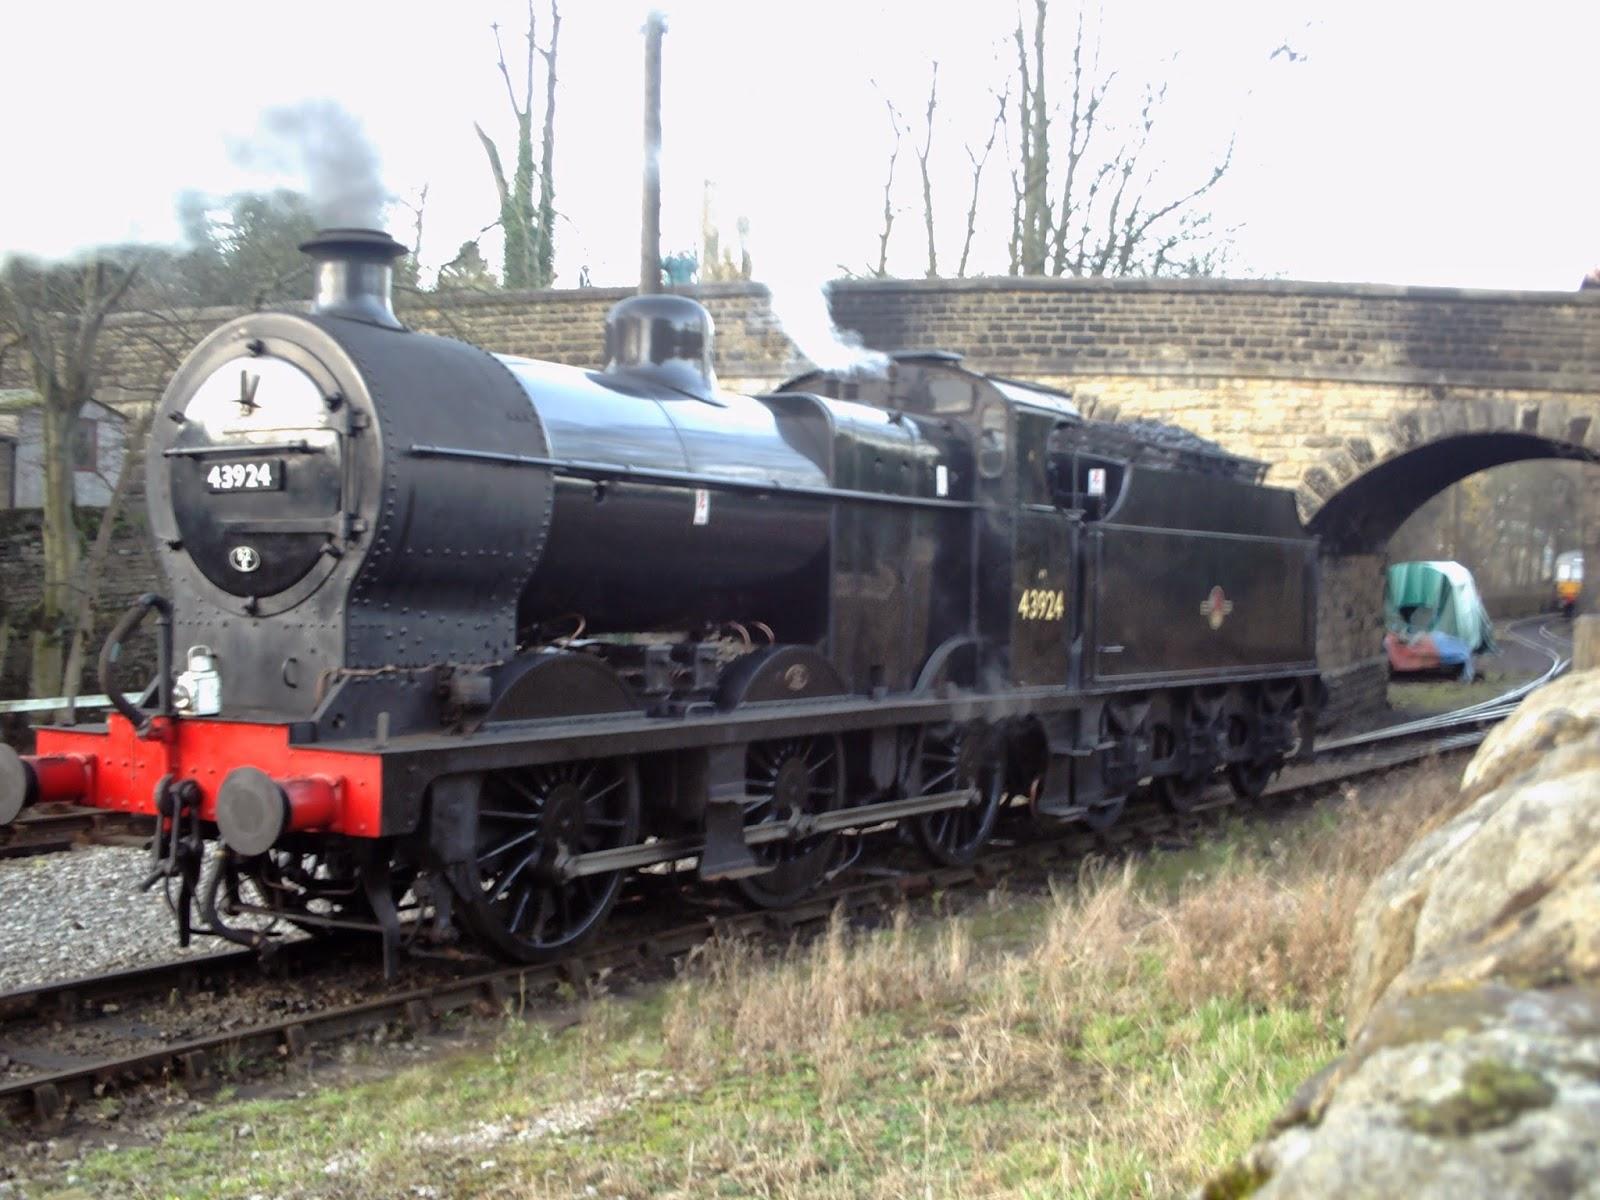 LMS 4F 43924 at Howarth